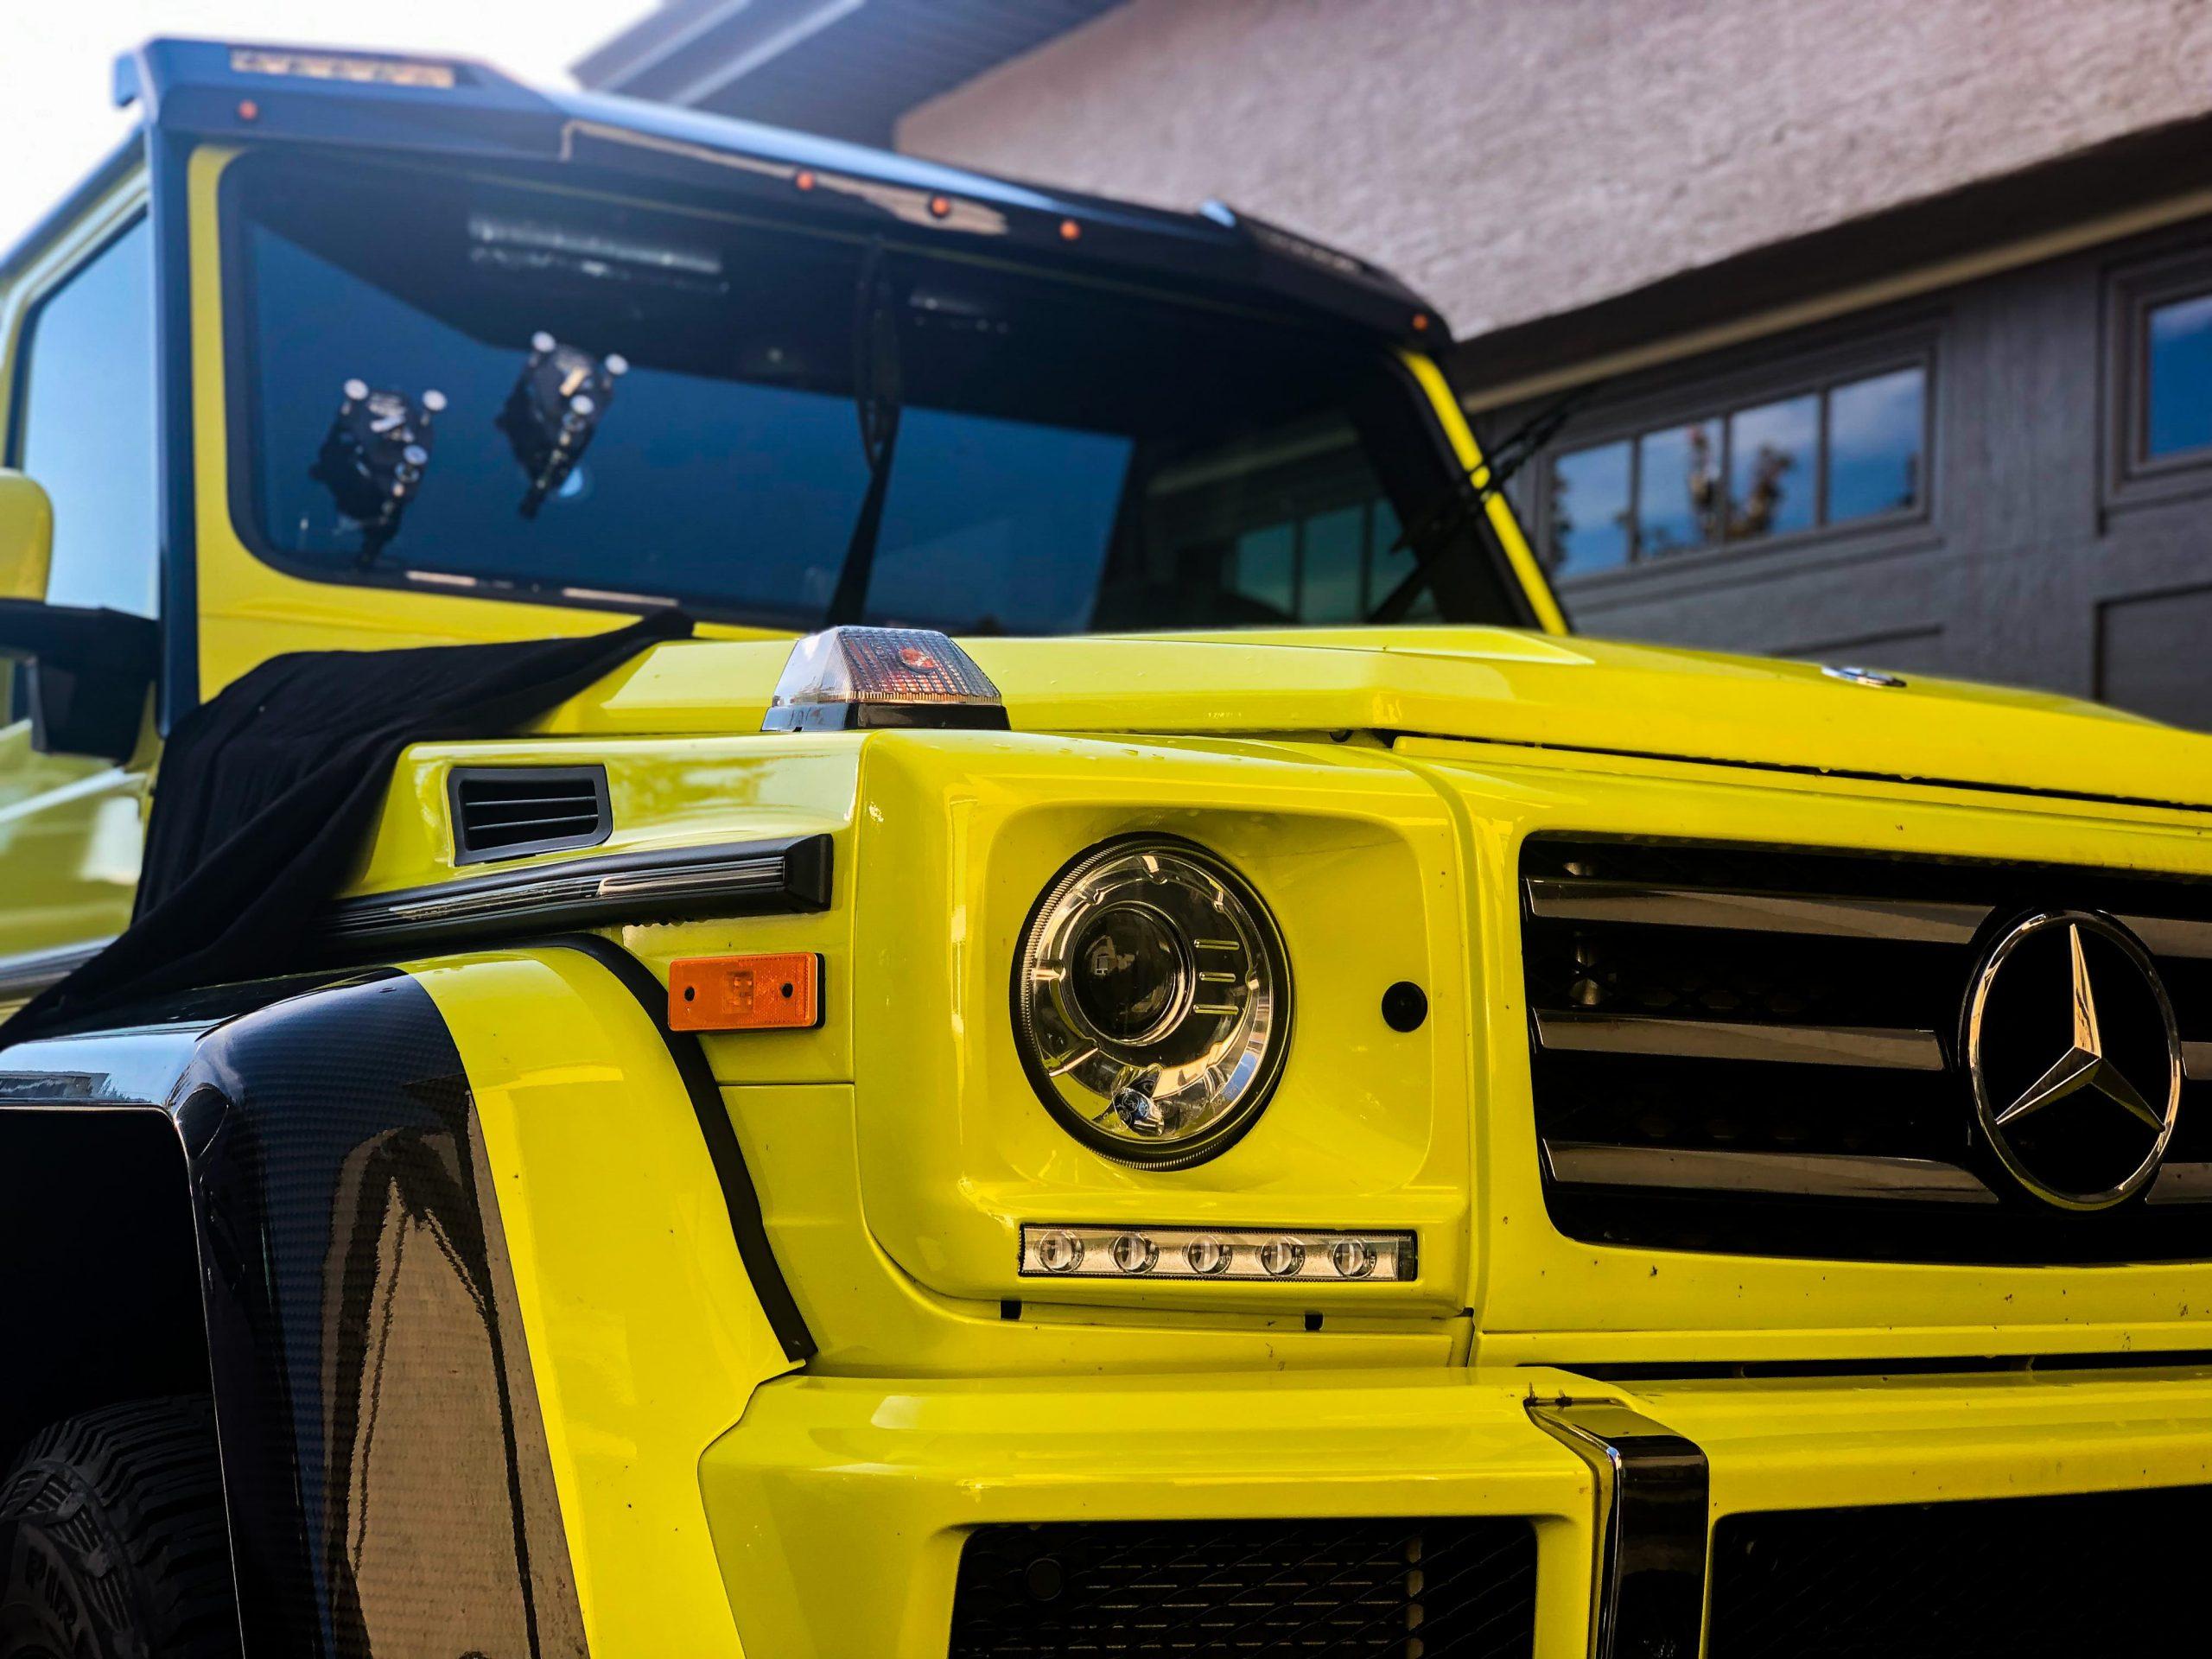 mercedes-benz g550 - windshield repair